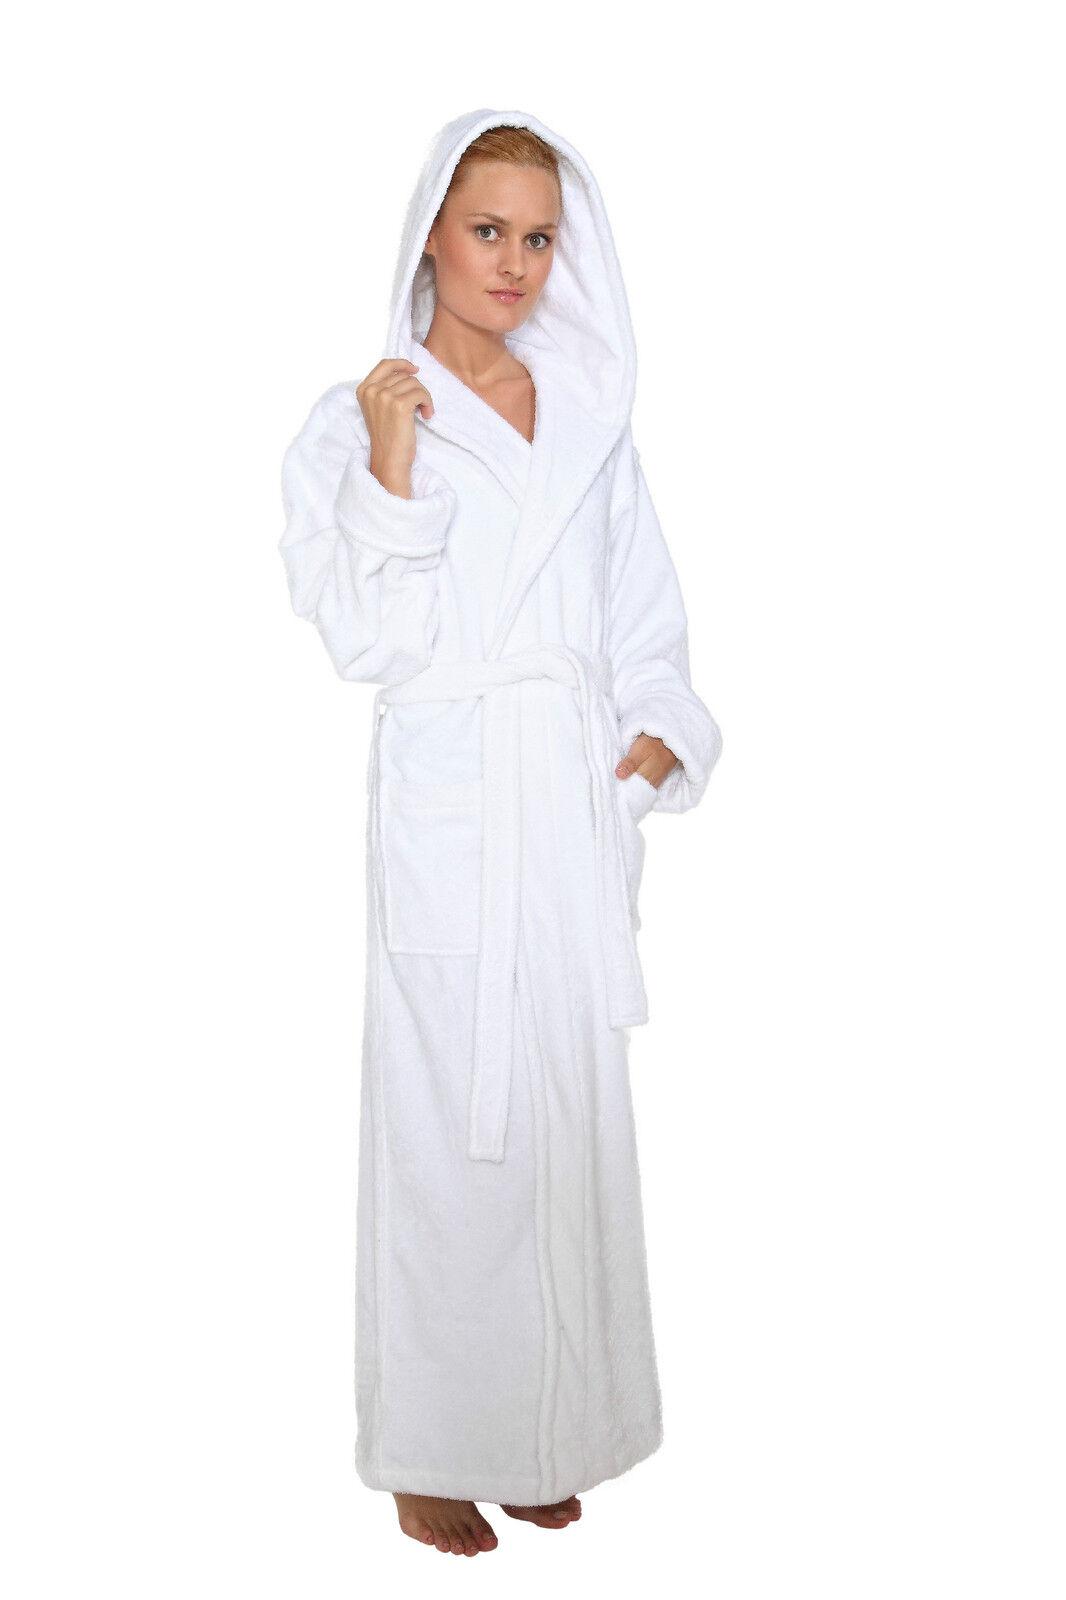 Hooded Bathrobe Womens Long Turkish Terry Cotton Spa Robe